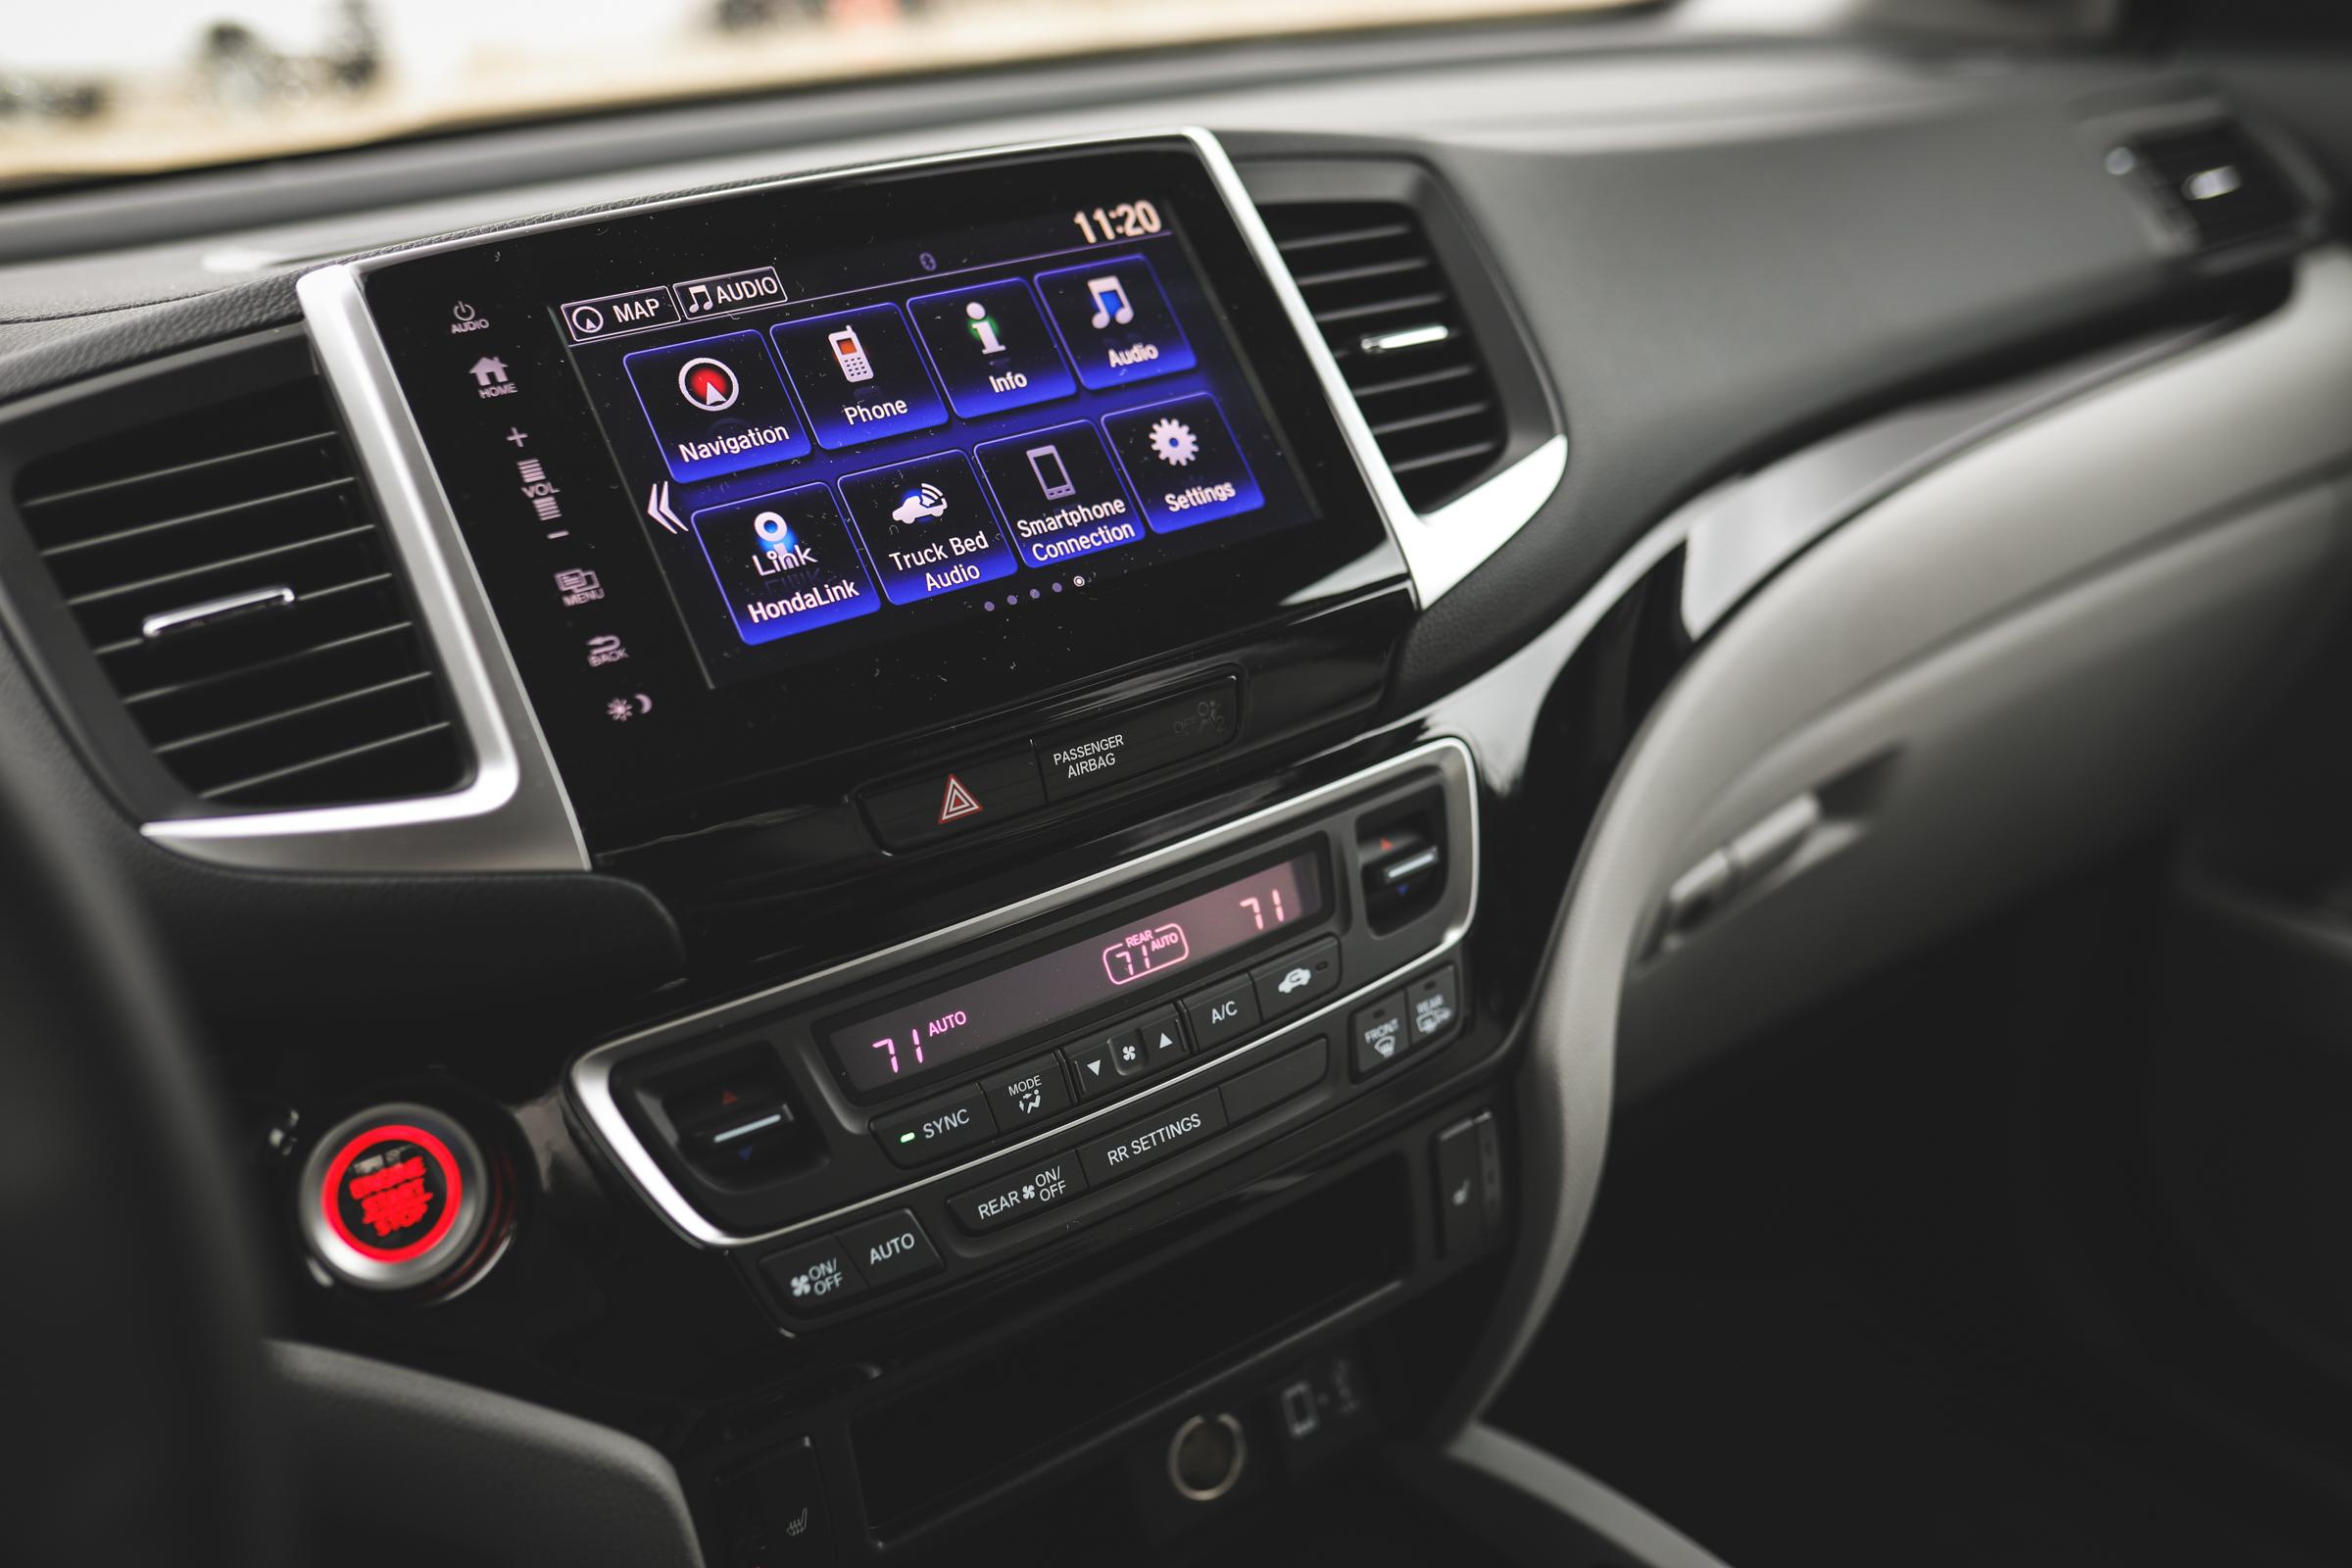 2020 Honda Ridgeline RTL-E infotainment screen